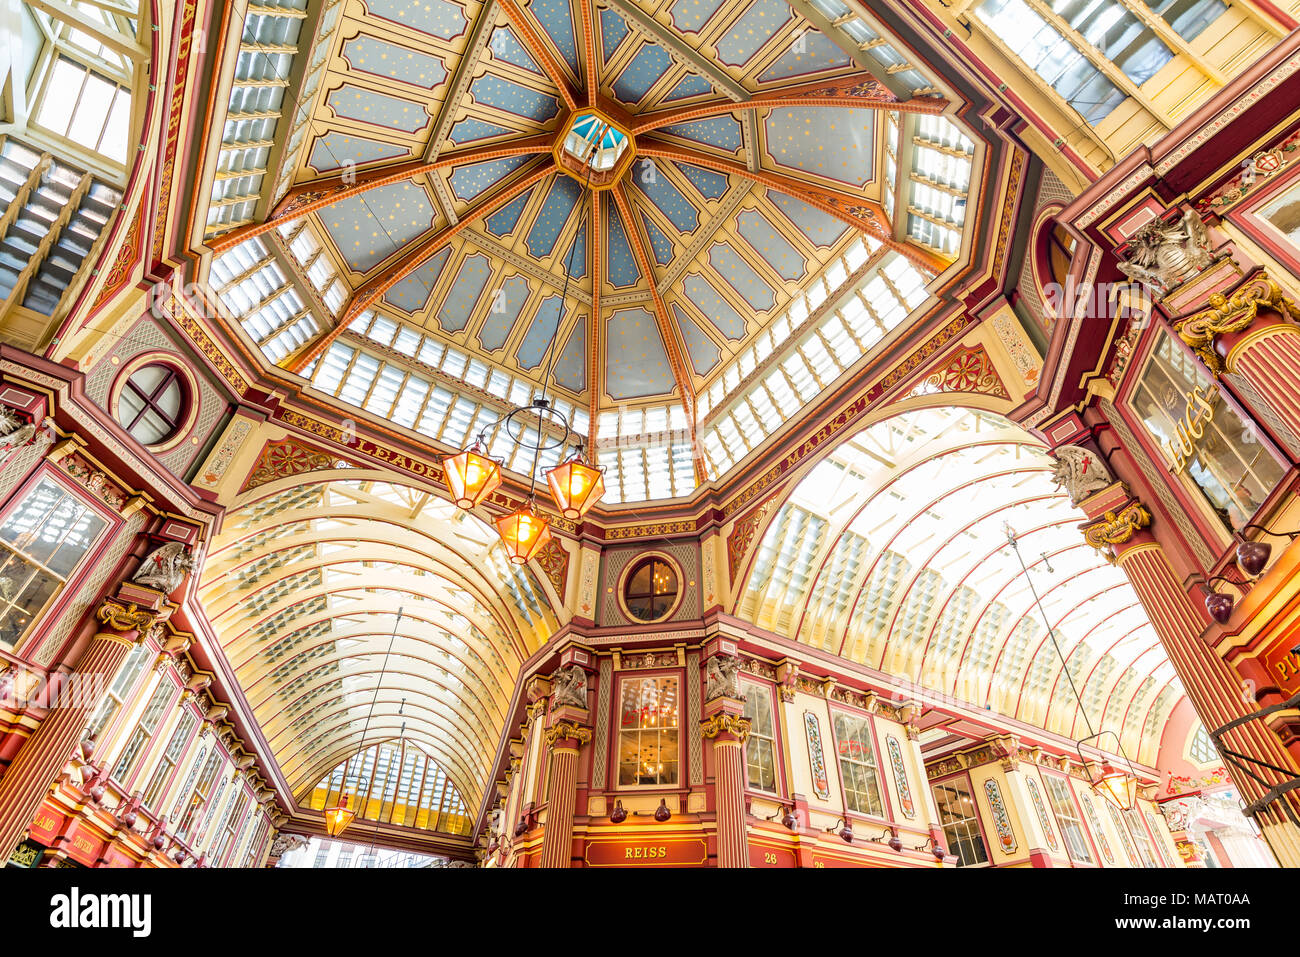 Leadenhall Market, City of London, UK - Stock Image